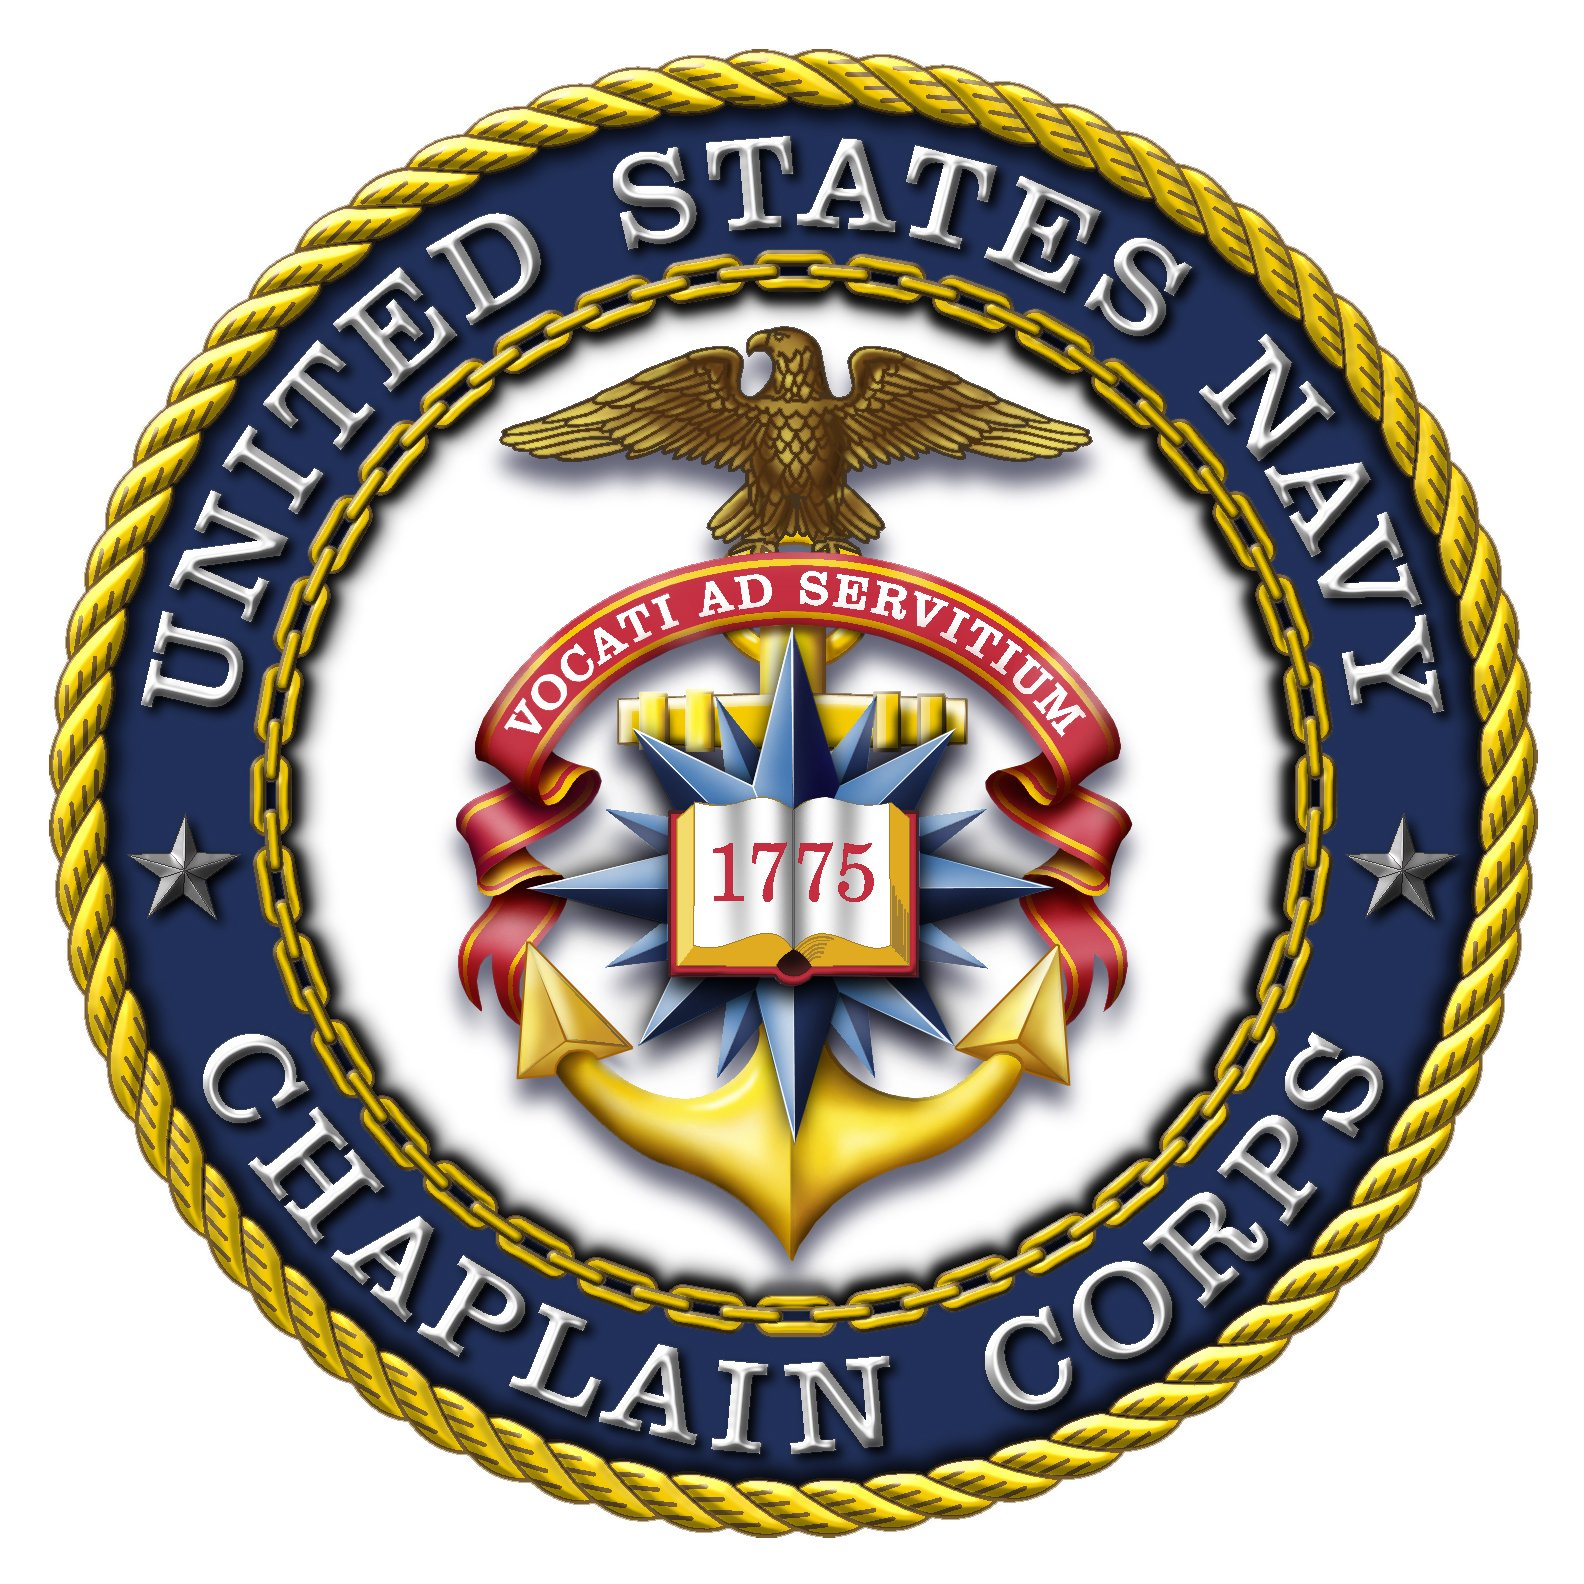 URL httpwwwsmscscomphotomarine corps wallpaper border36html 1584x1584